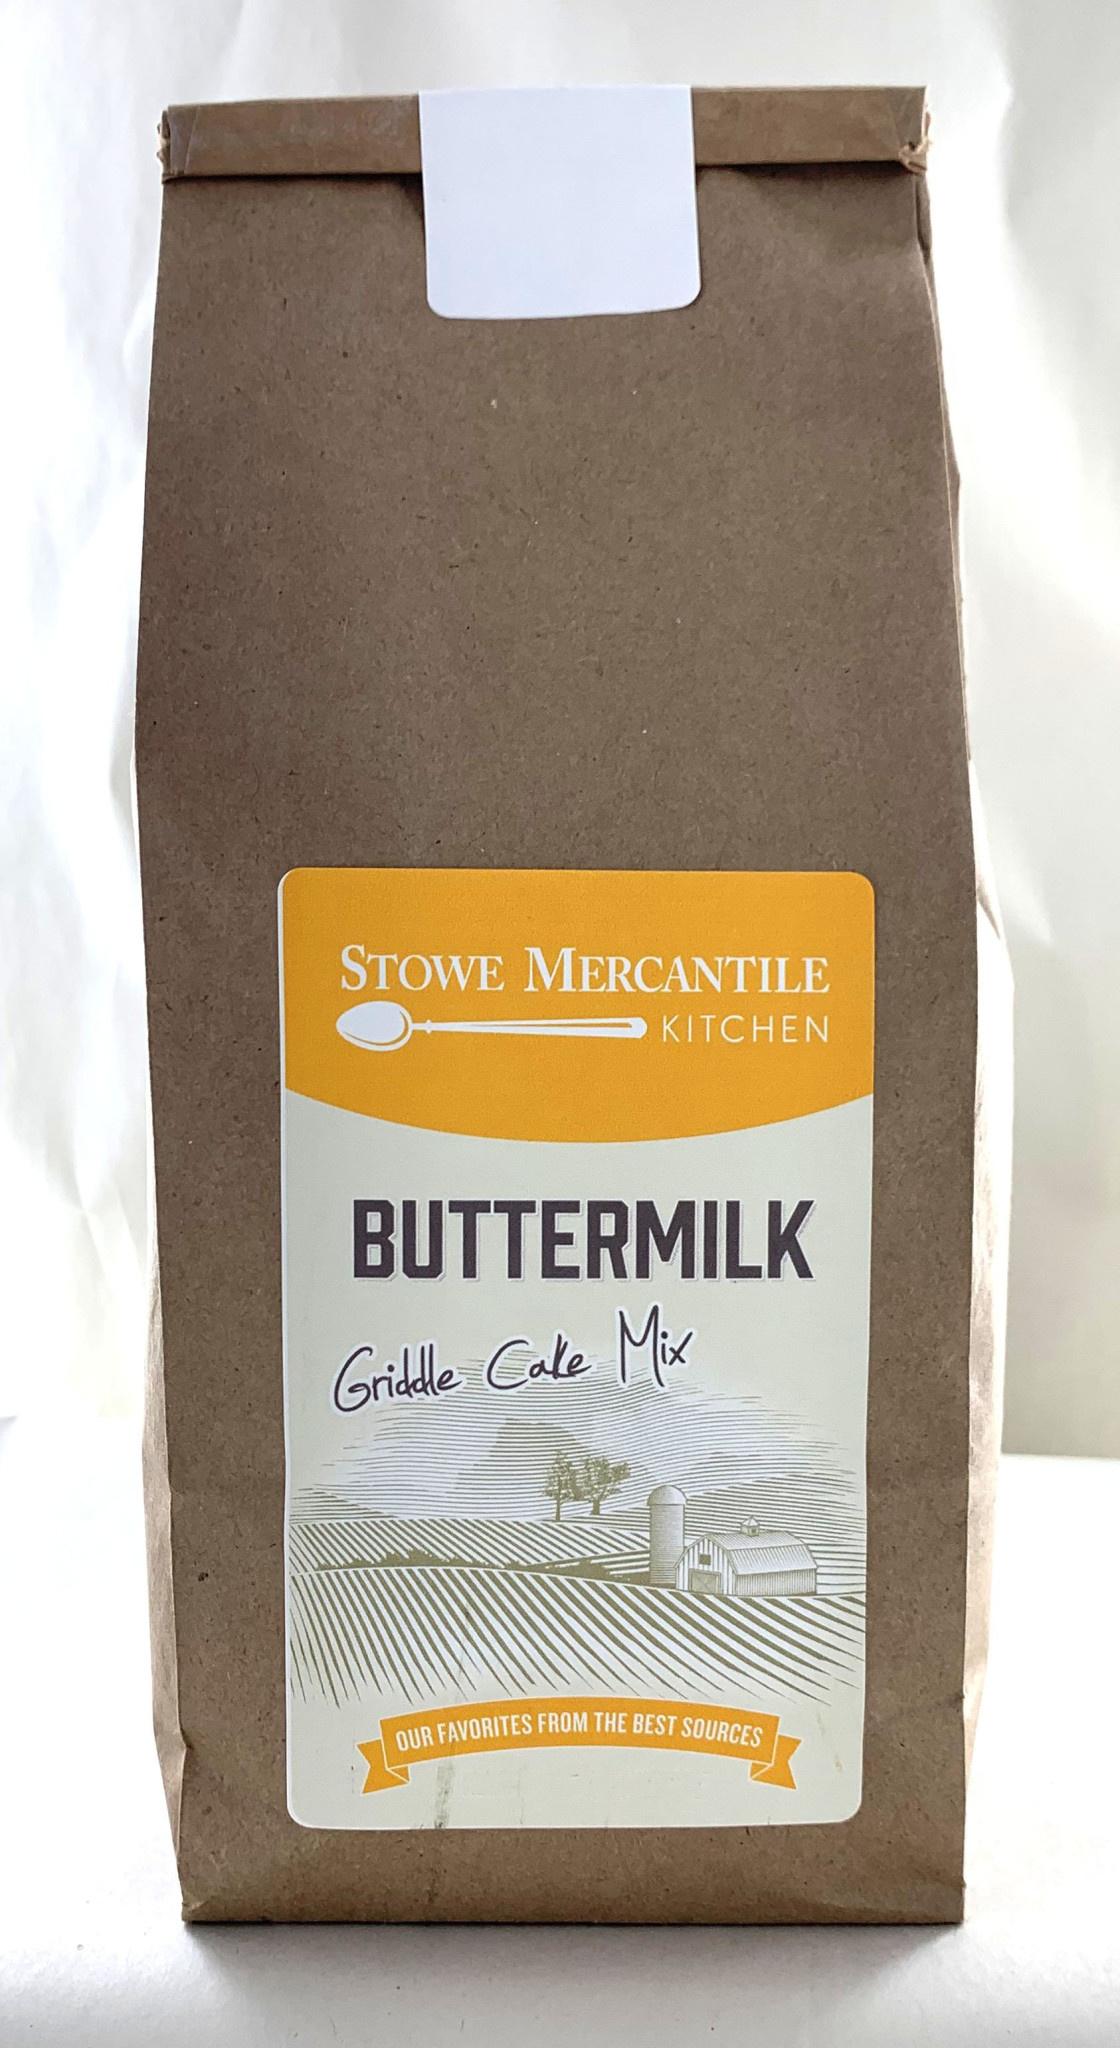 Stowe Mercantile Kitchen Griddle Cake Mix - 1lb, Buttermilk